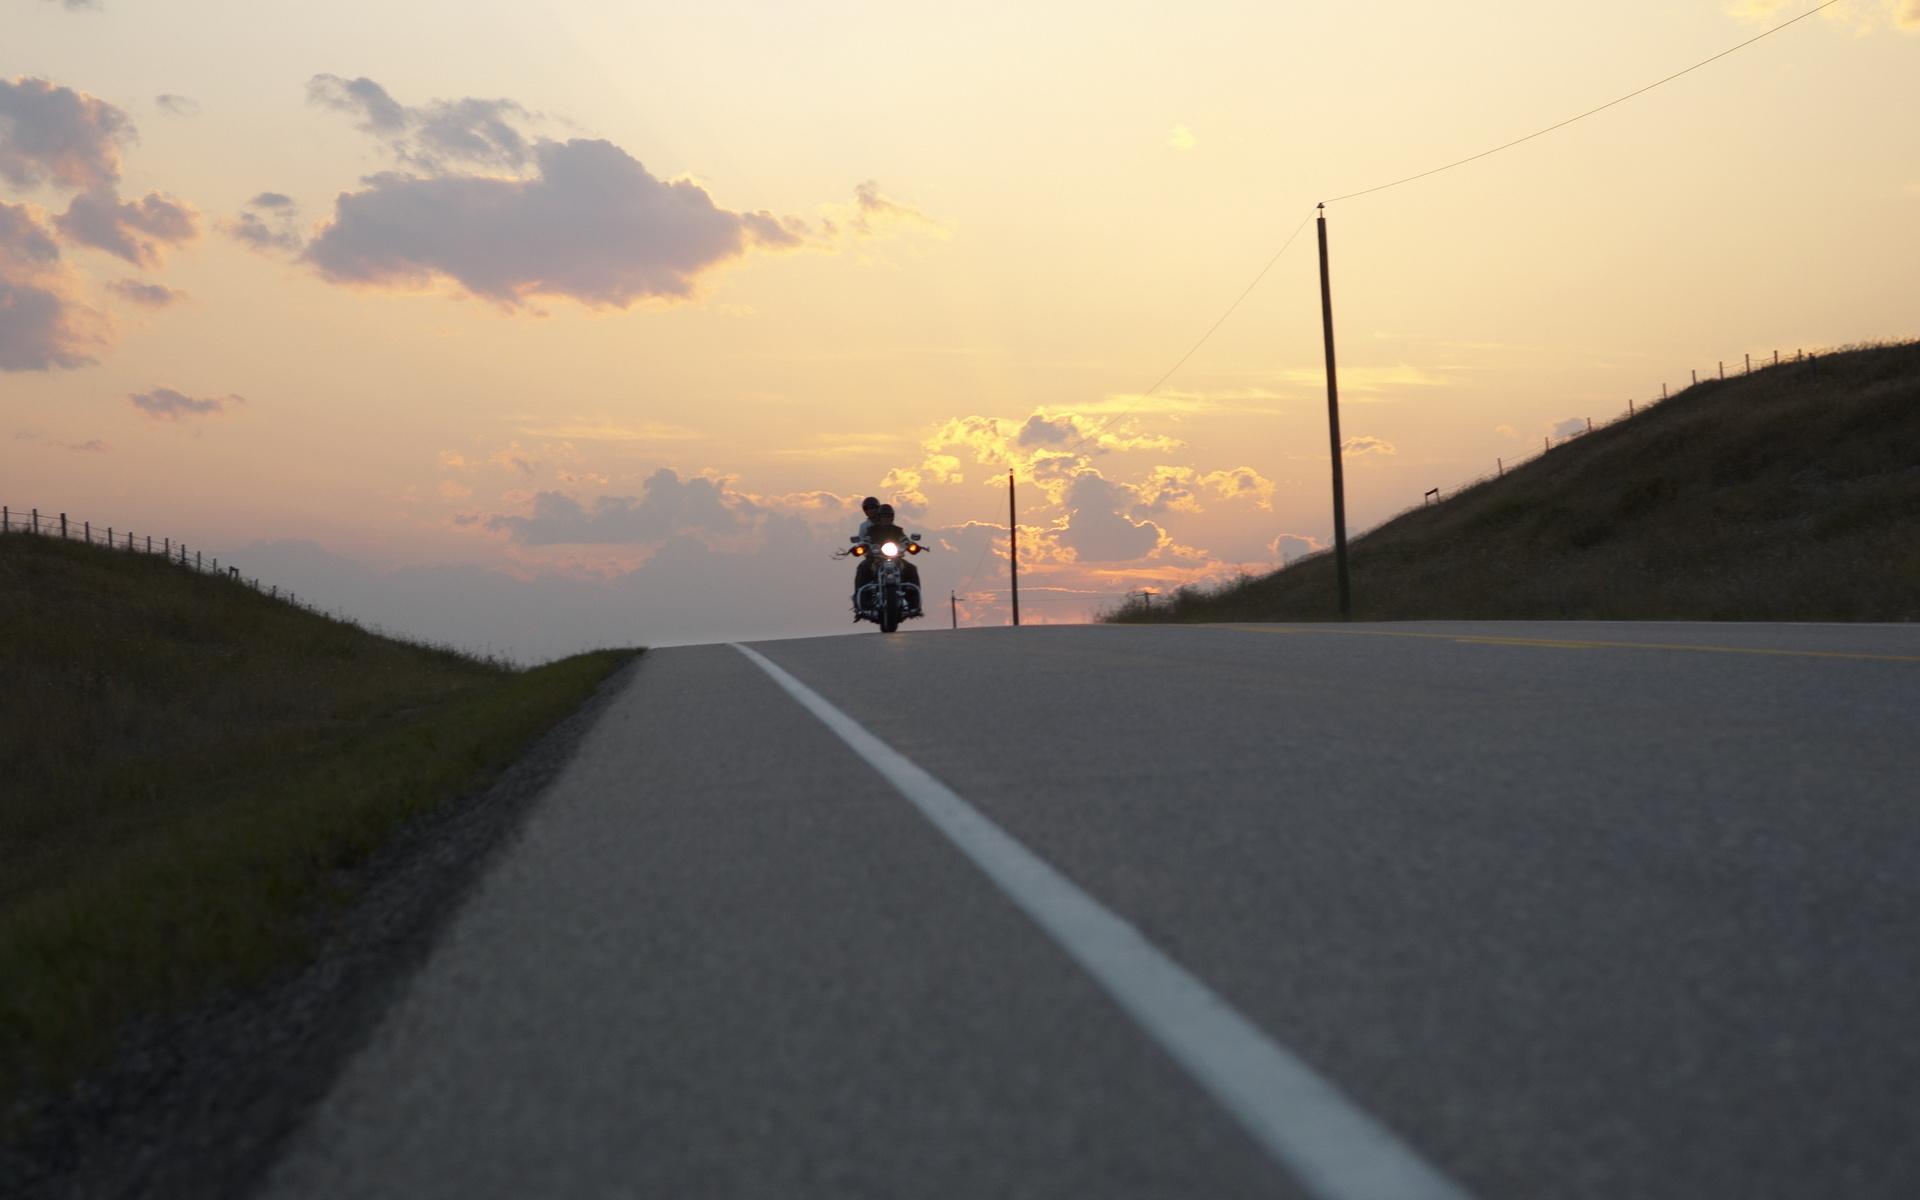 Картинки о дорогах байкерах